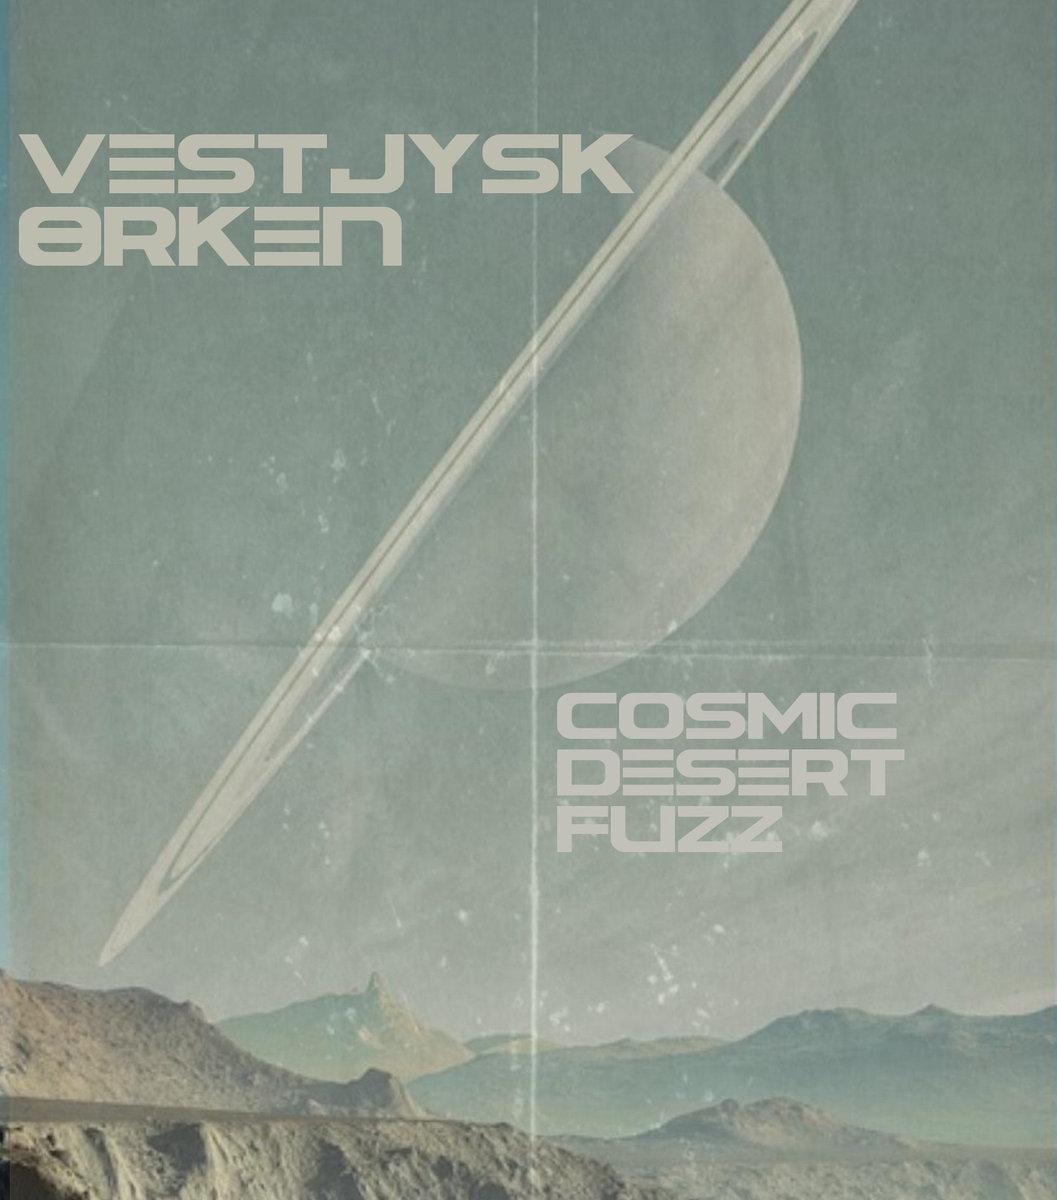 Vestjysk orken Cosmic Desert Fuzz